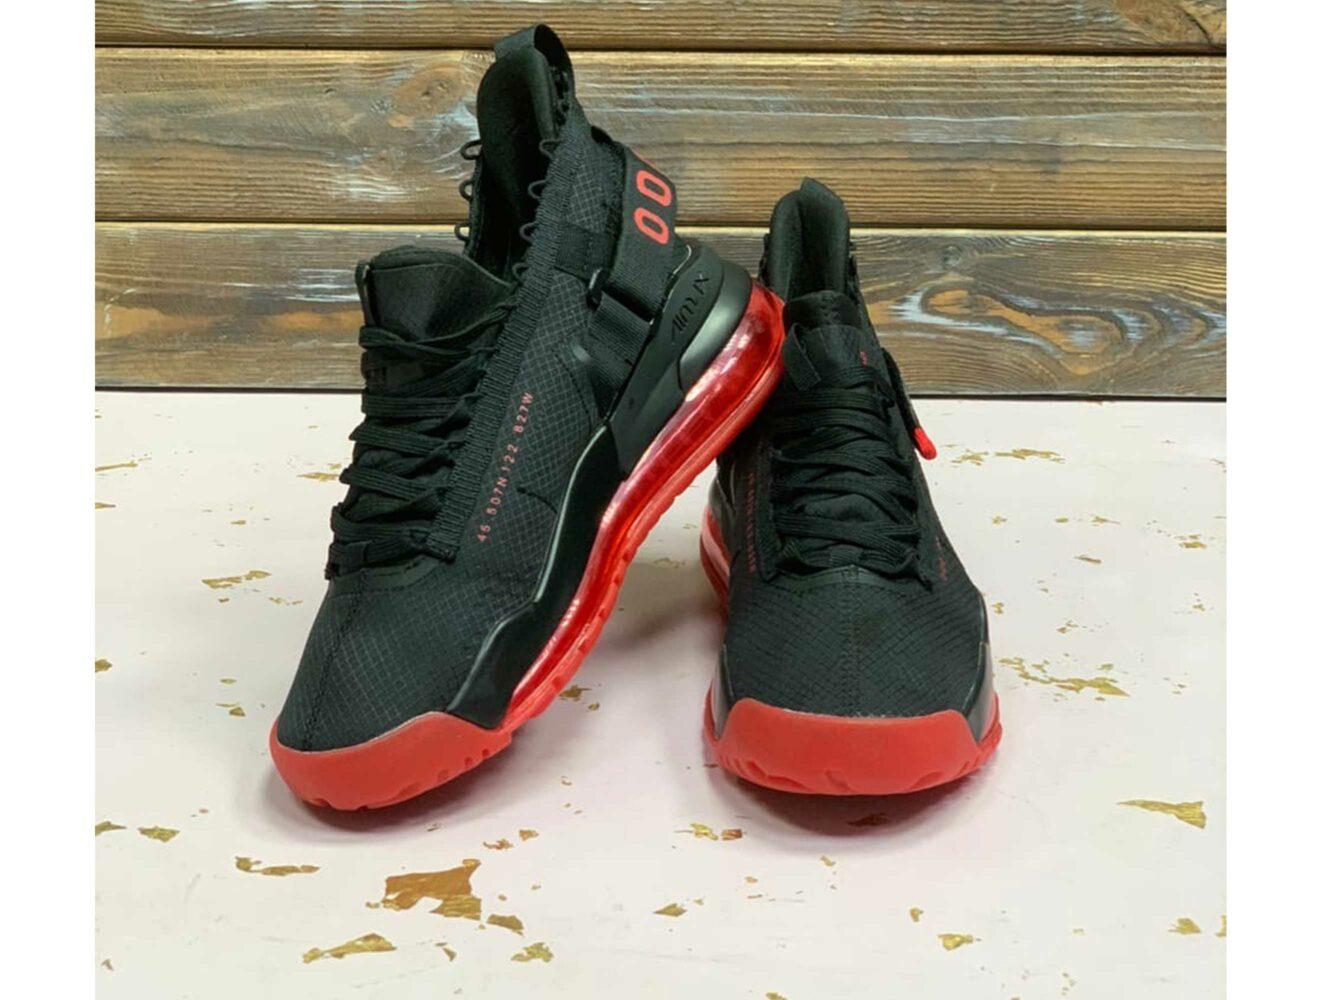 Jordan proto max 720 black red BQ6623_006 купить